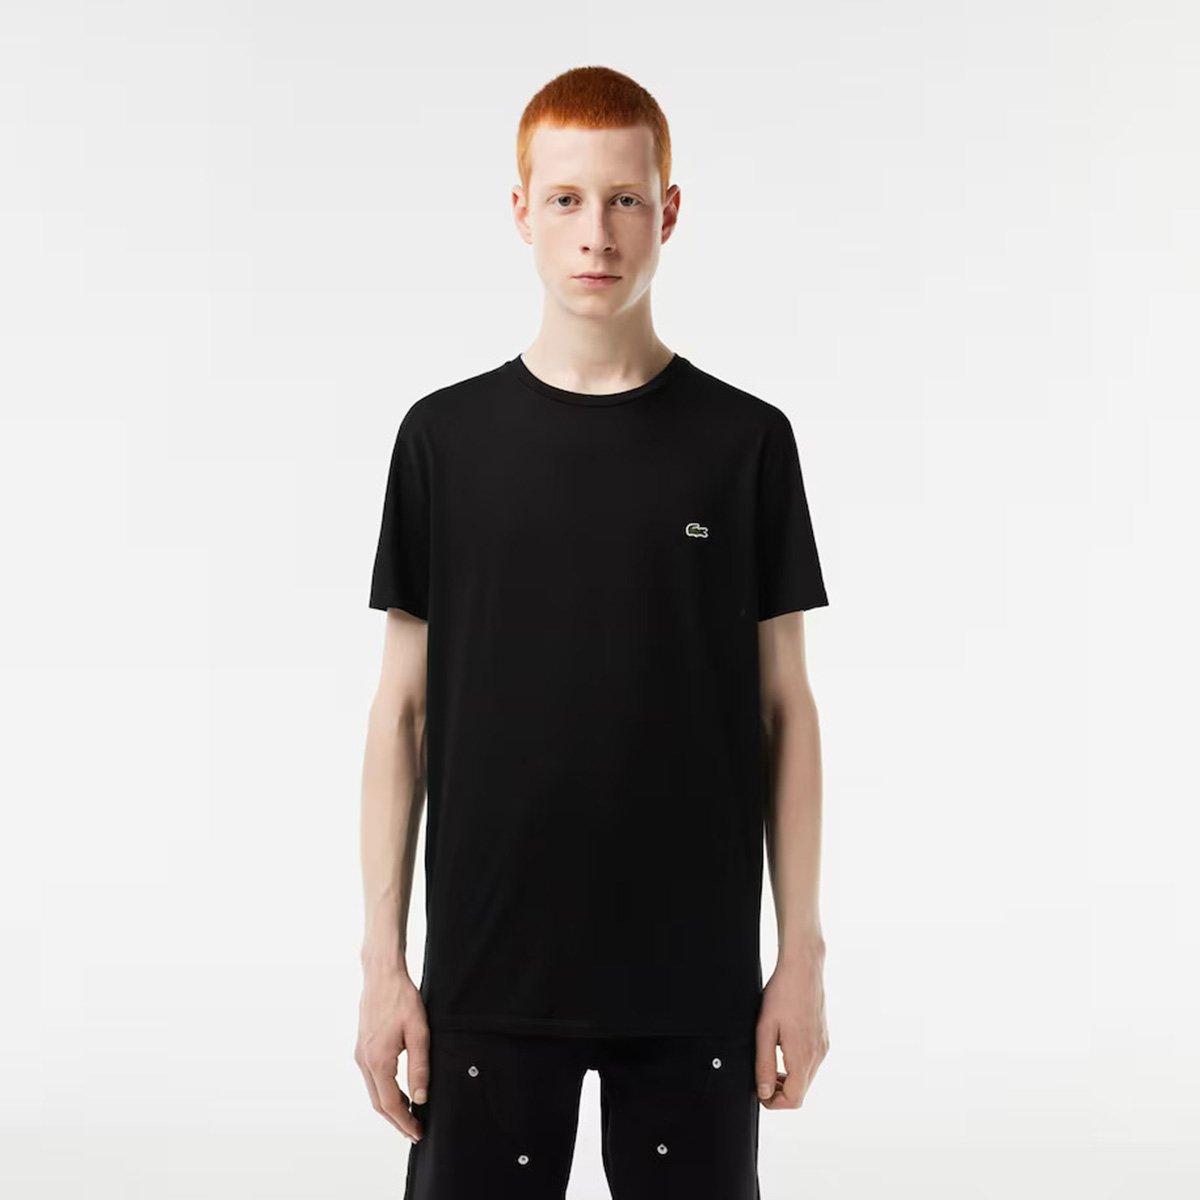 154655421f4 Camiseta Lacoste Básica Jersey Masculina